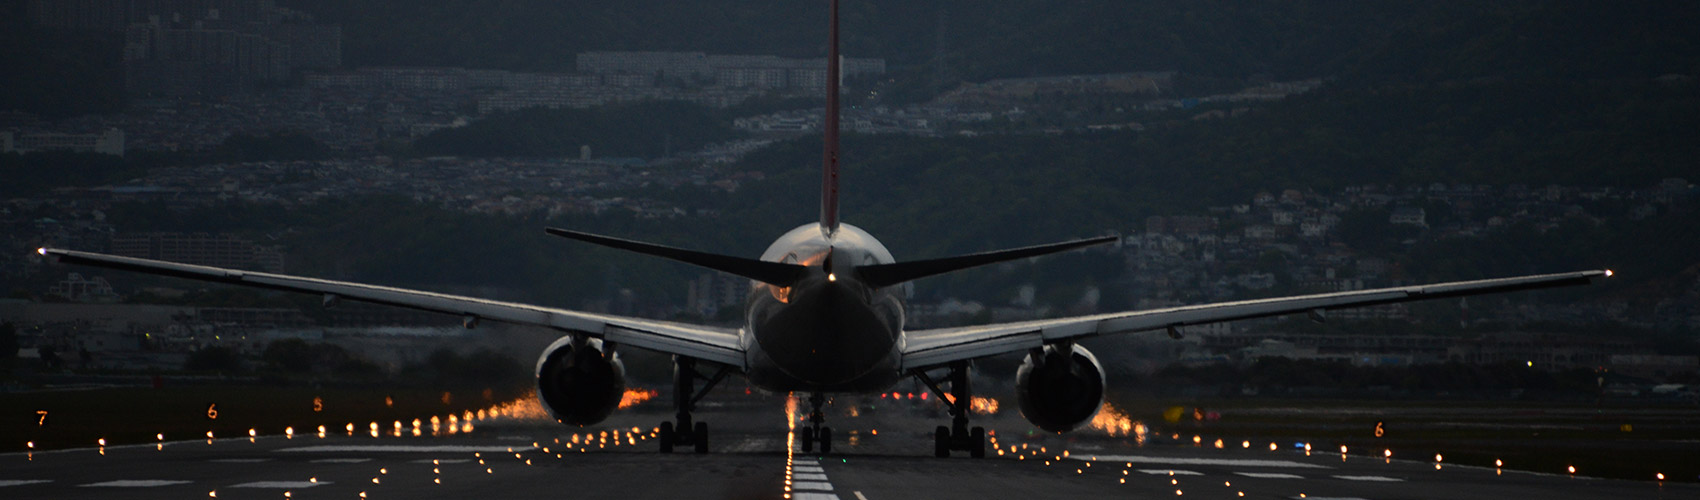 aereo-in-partenza-2